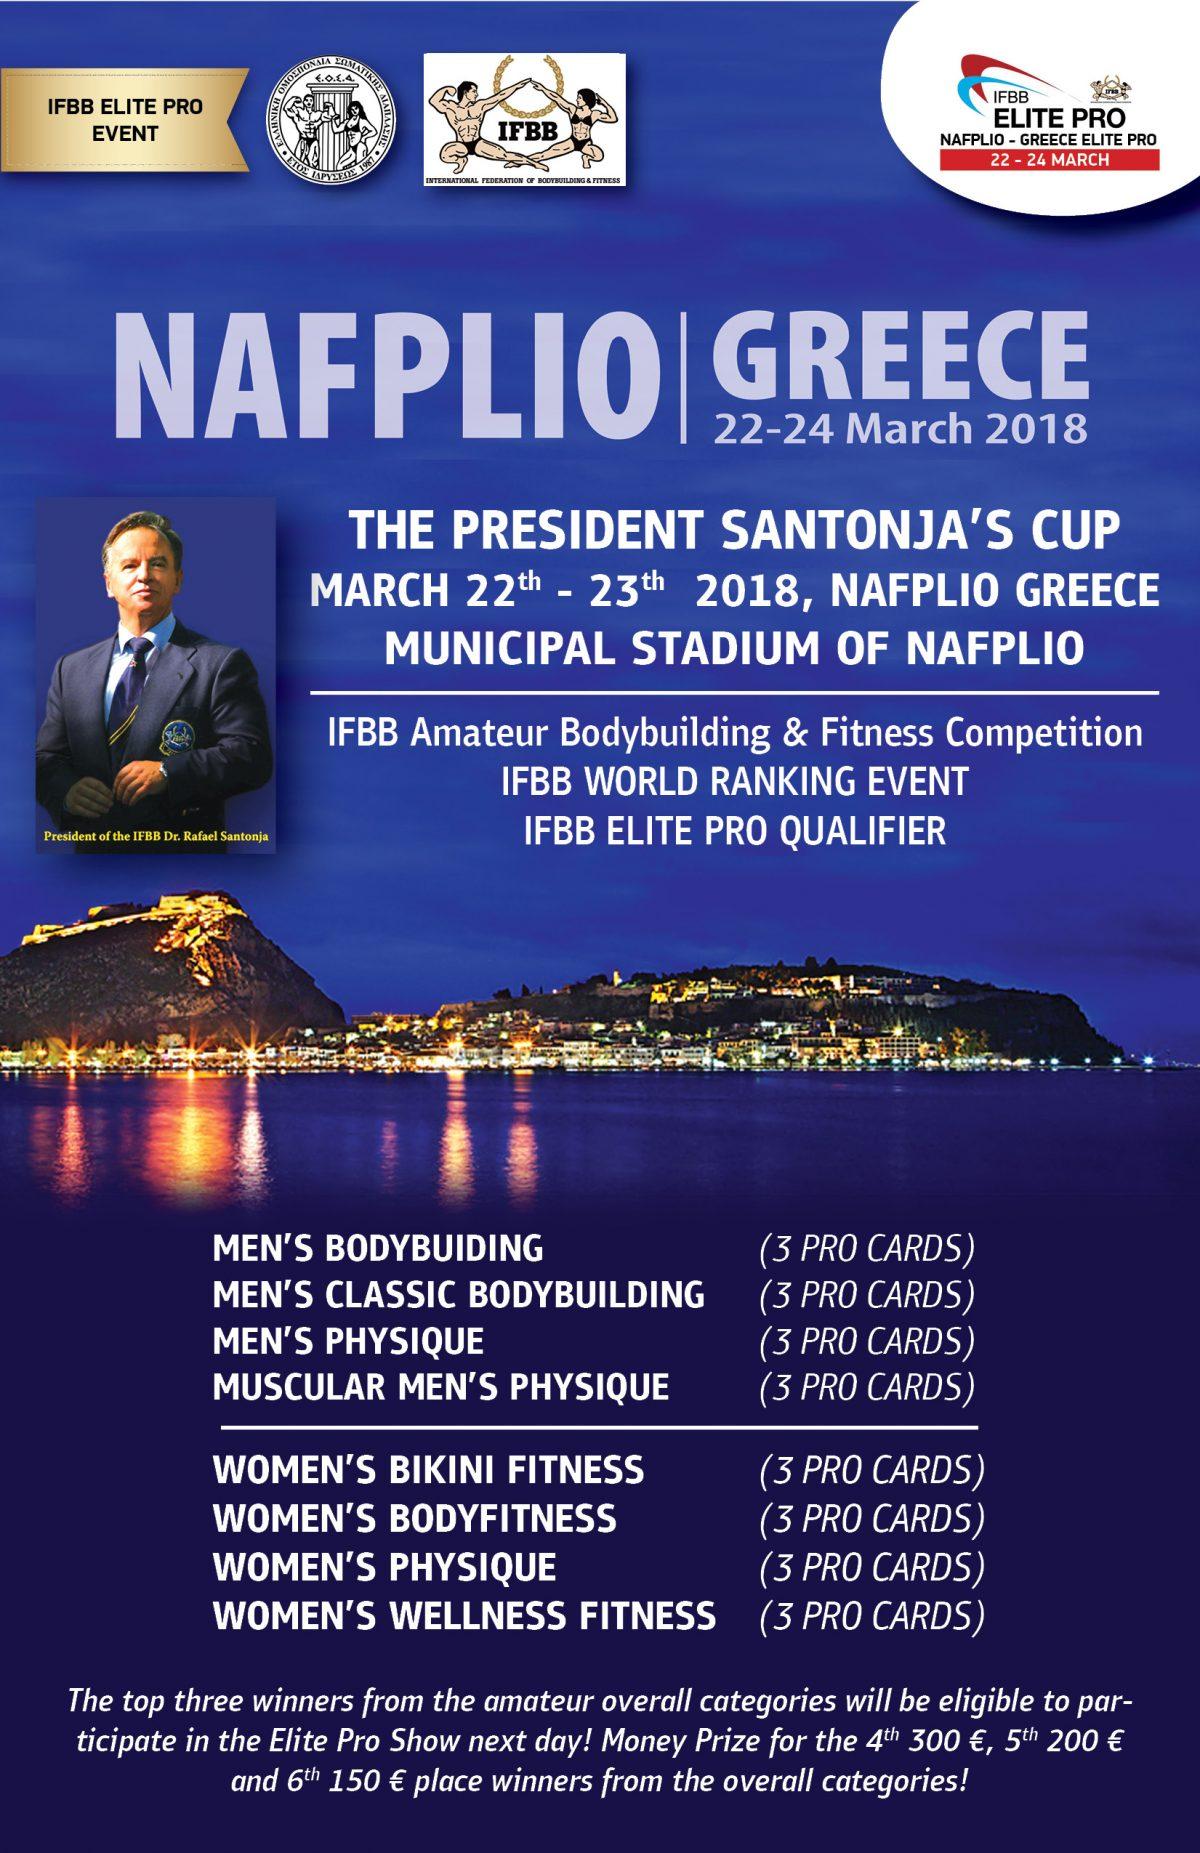 IFBB The President Santonja's Cup Nafplio 2018 @ Δημοτικό Στάδιο Ναυπλίου | Nafplio | Greece